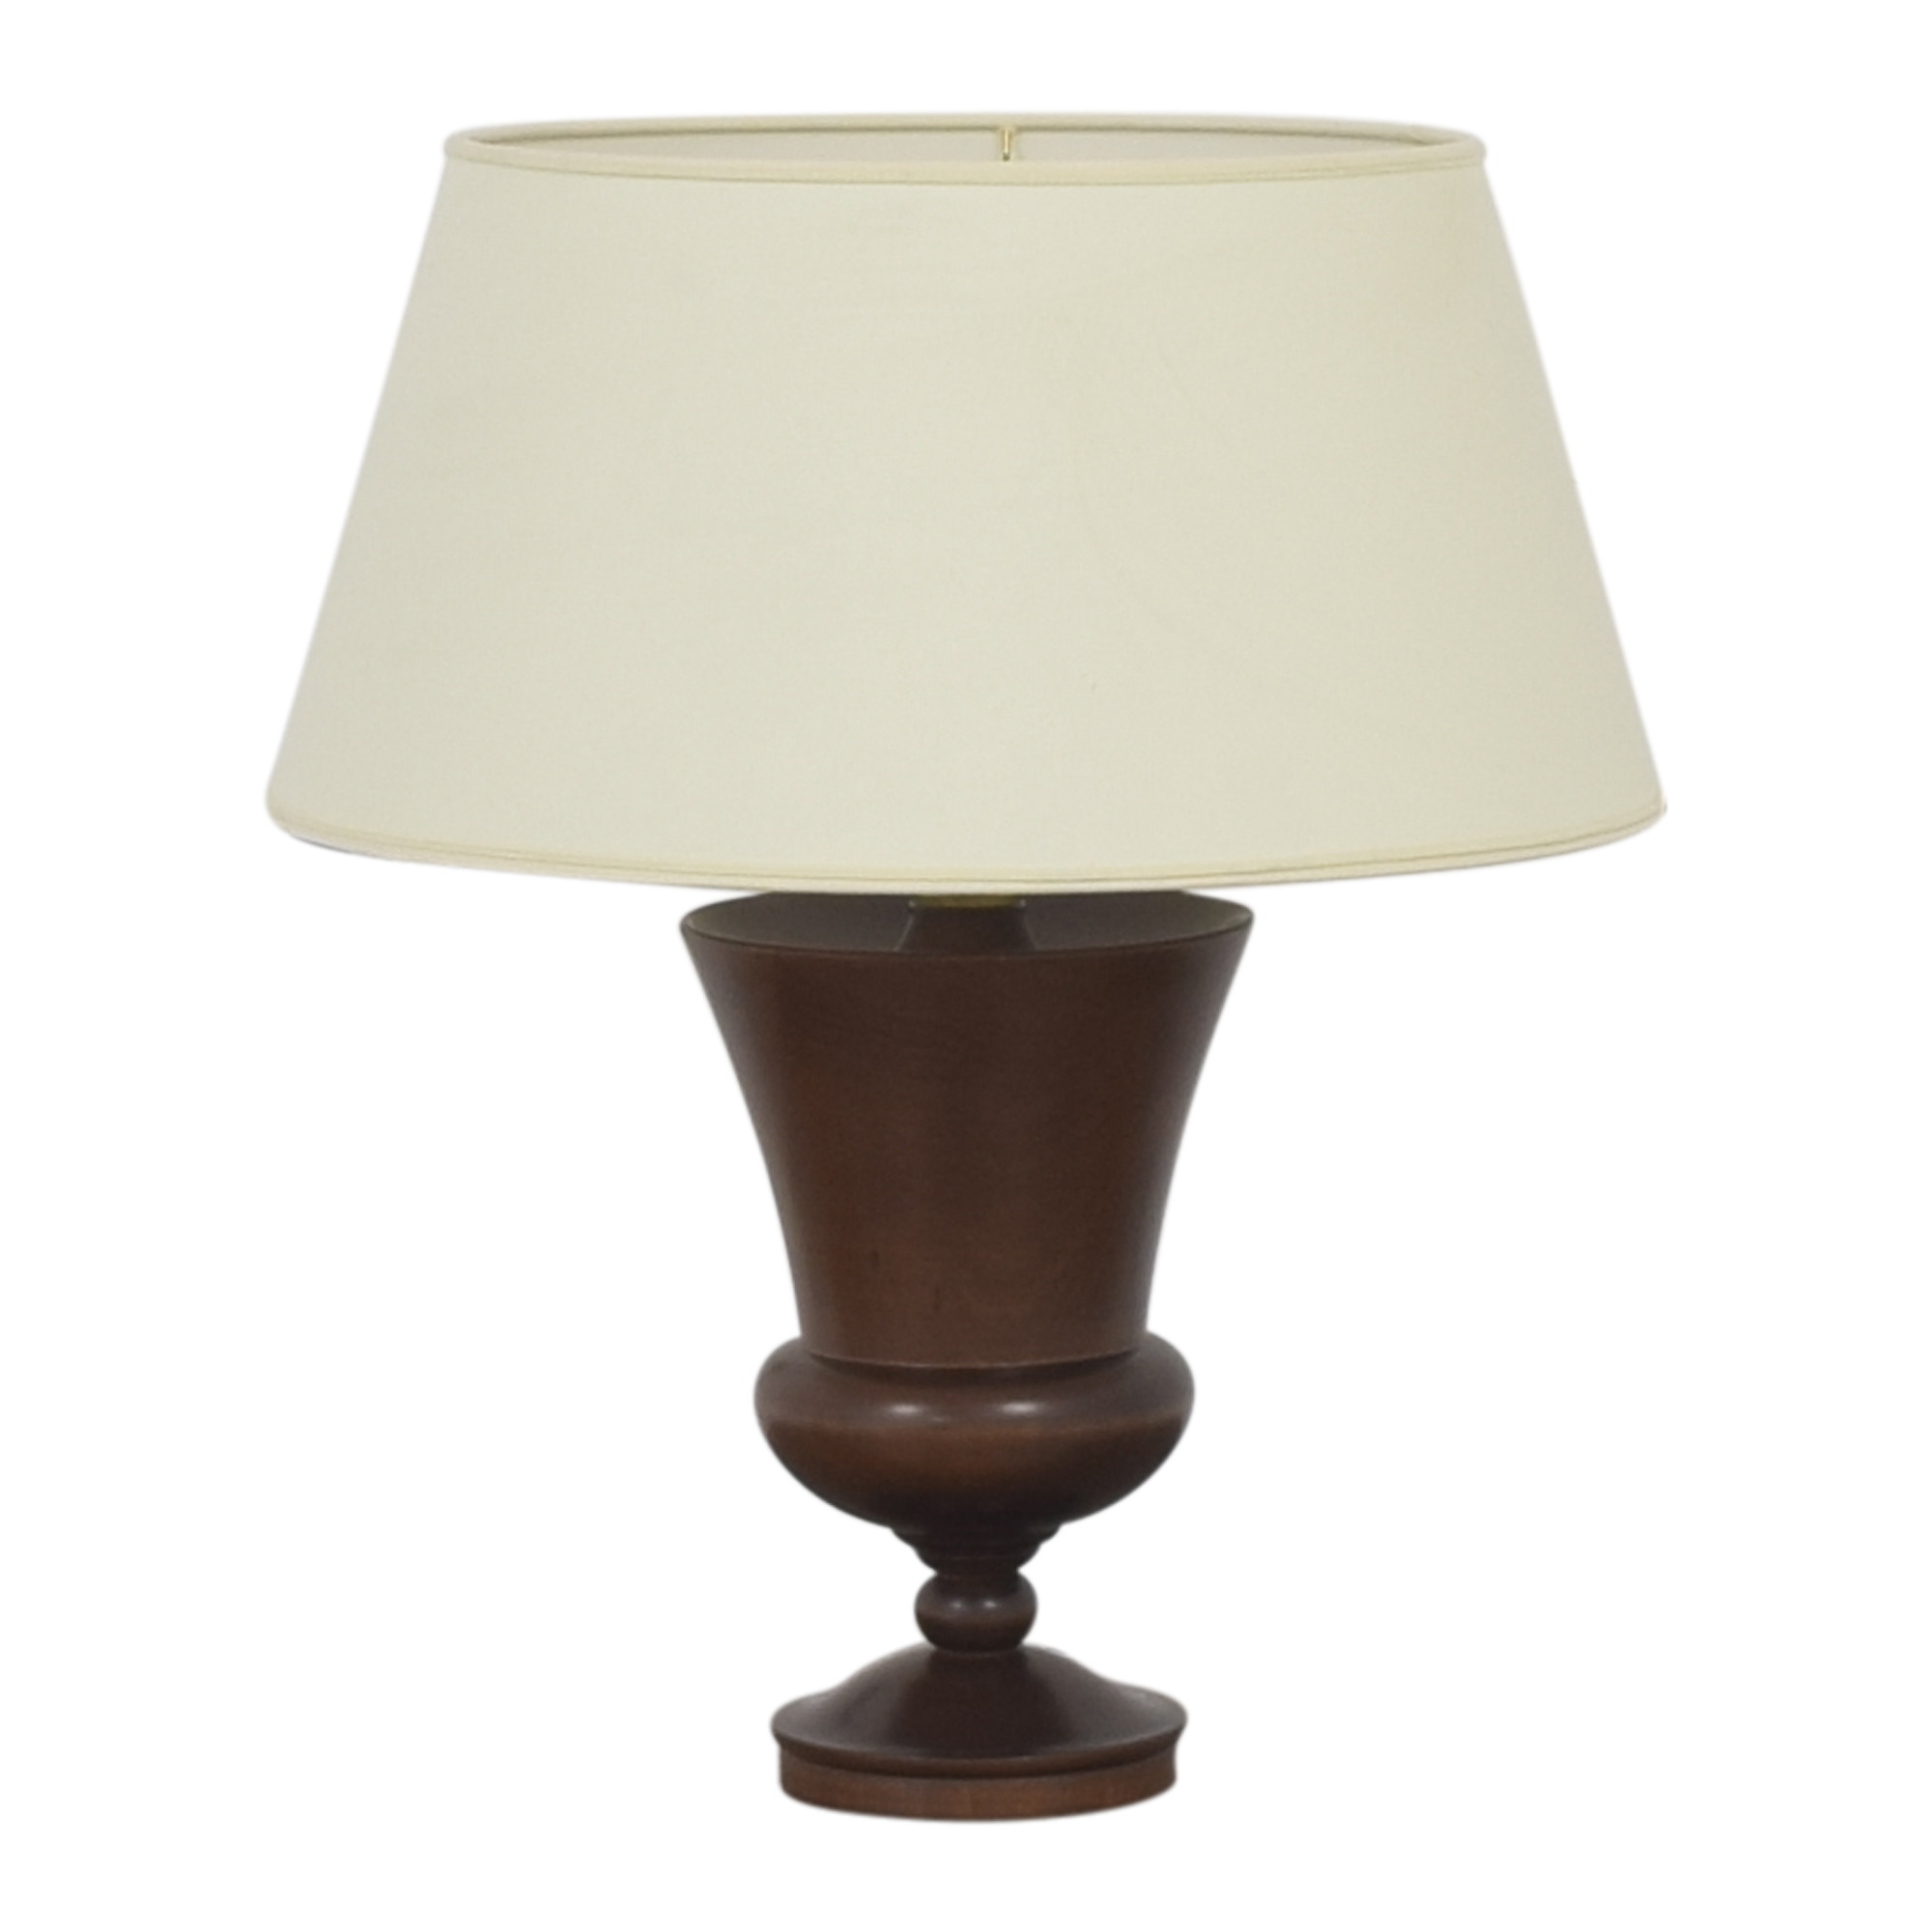 Baker Furniture Baker Furniture Table Lamp second hand